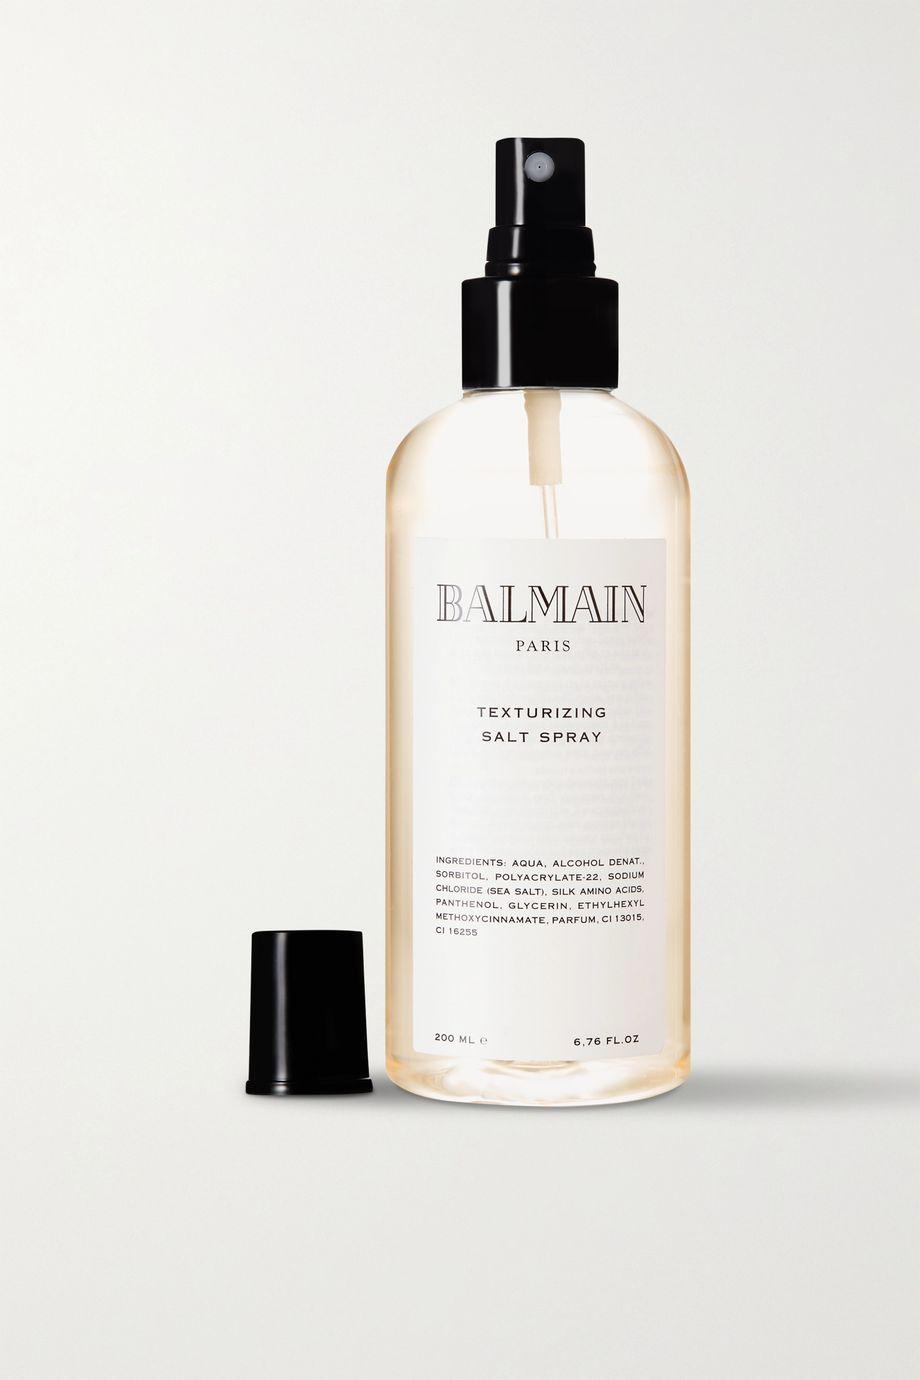 Balmain Paris Hair Couture Texturizing Salt Spray, 200ml